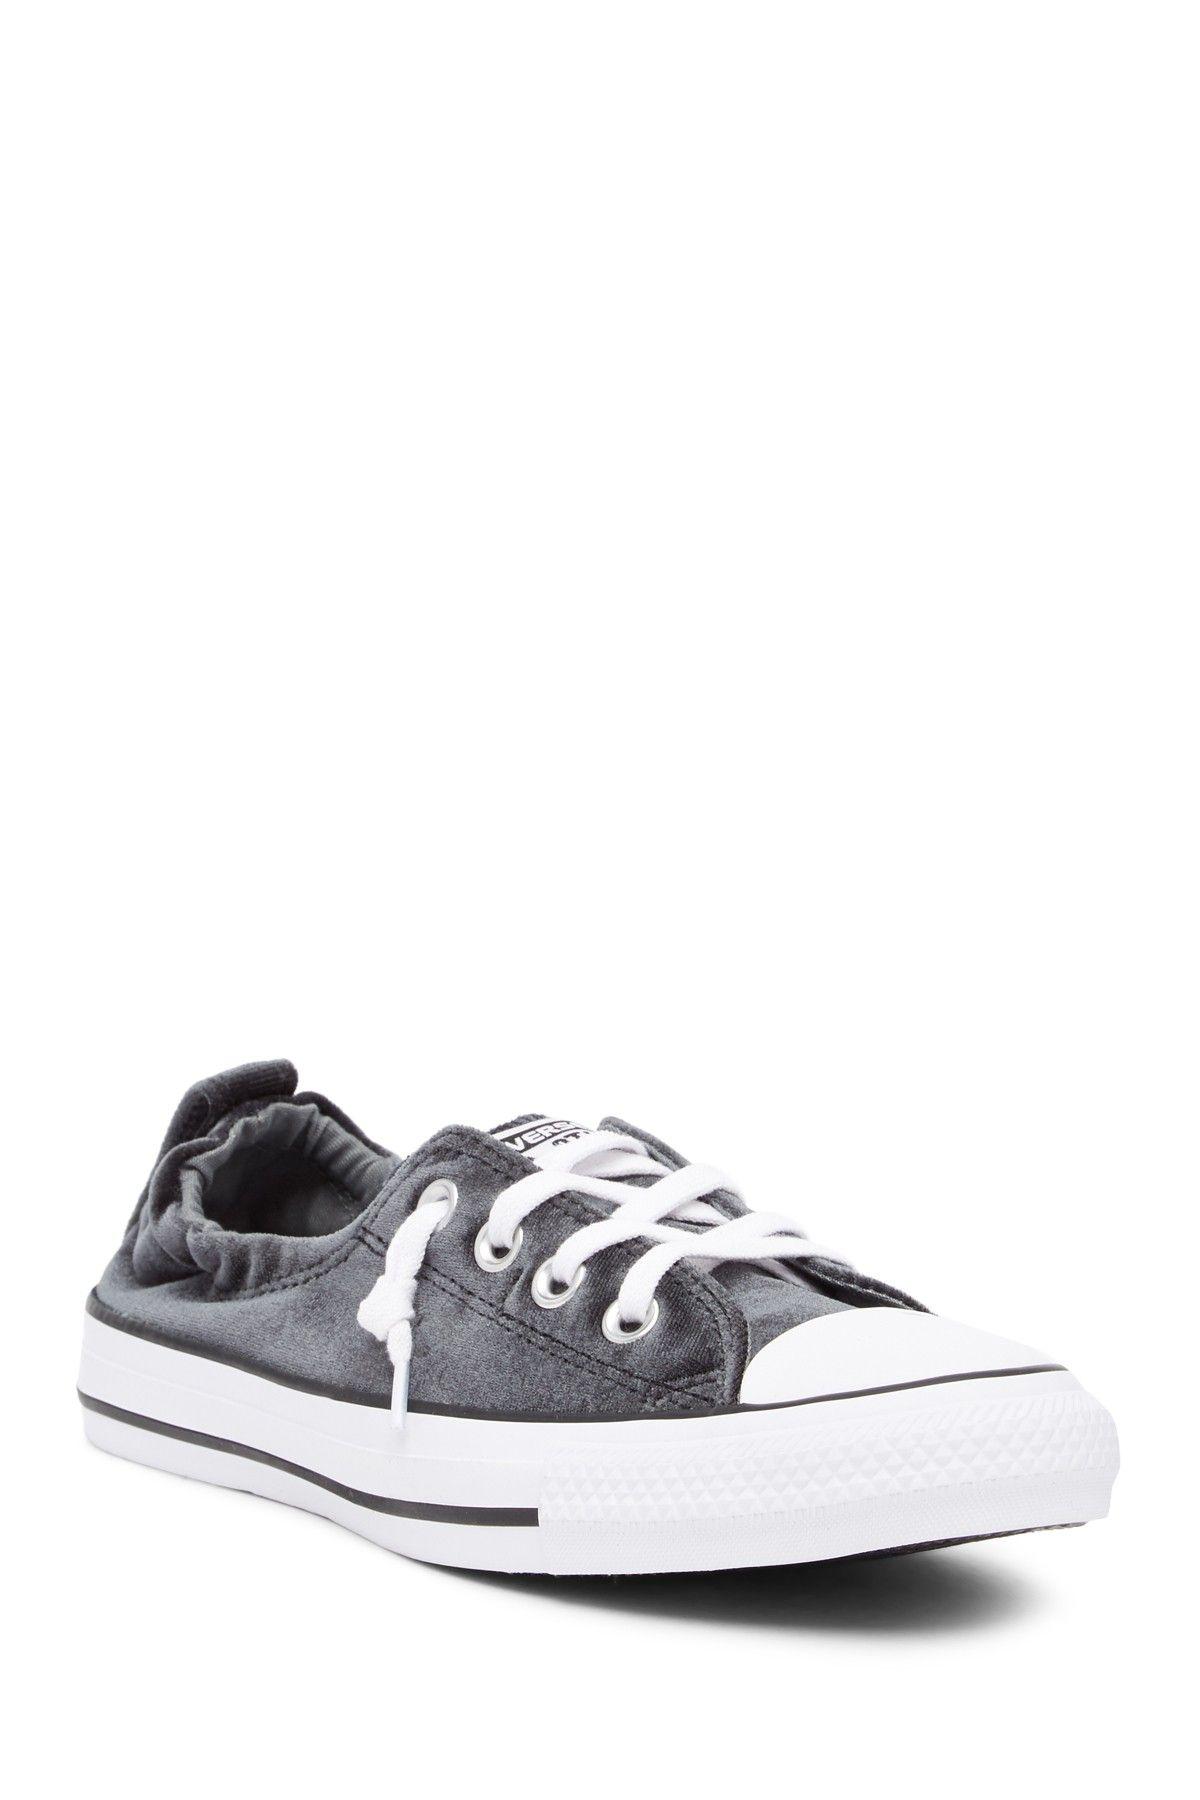 b9fd9e466c4881 Converse Chuck Taylor All Star Shoreline Sneaker (Women)